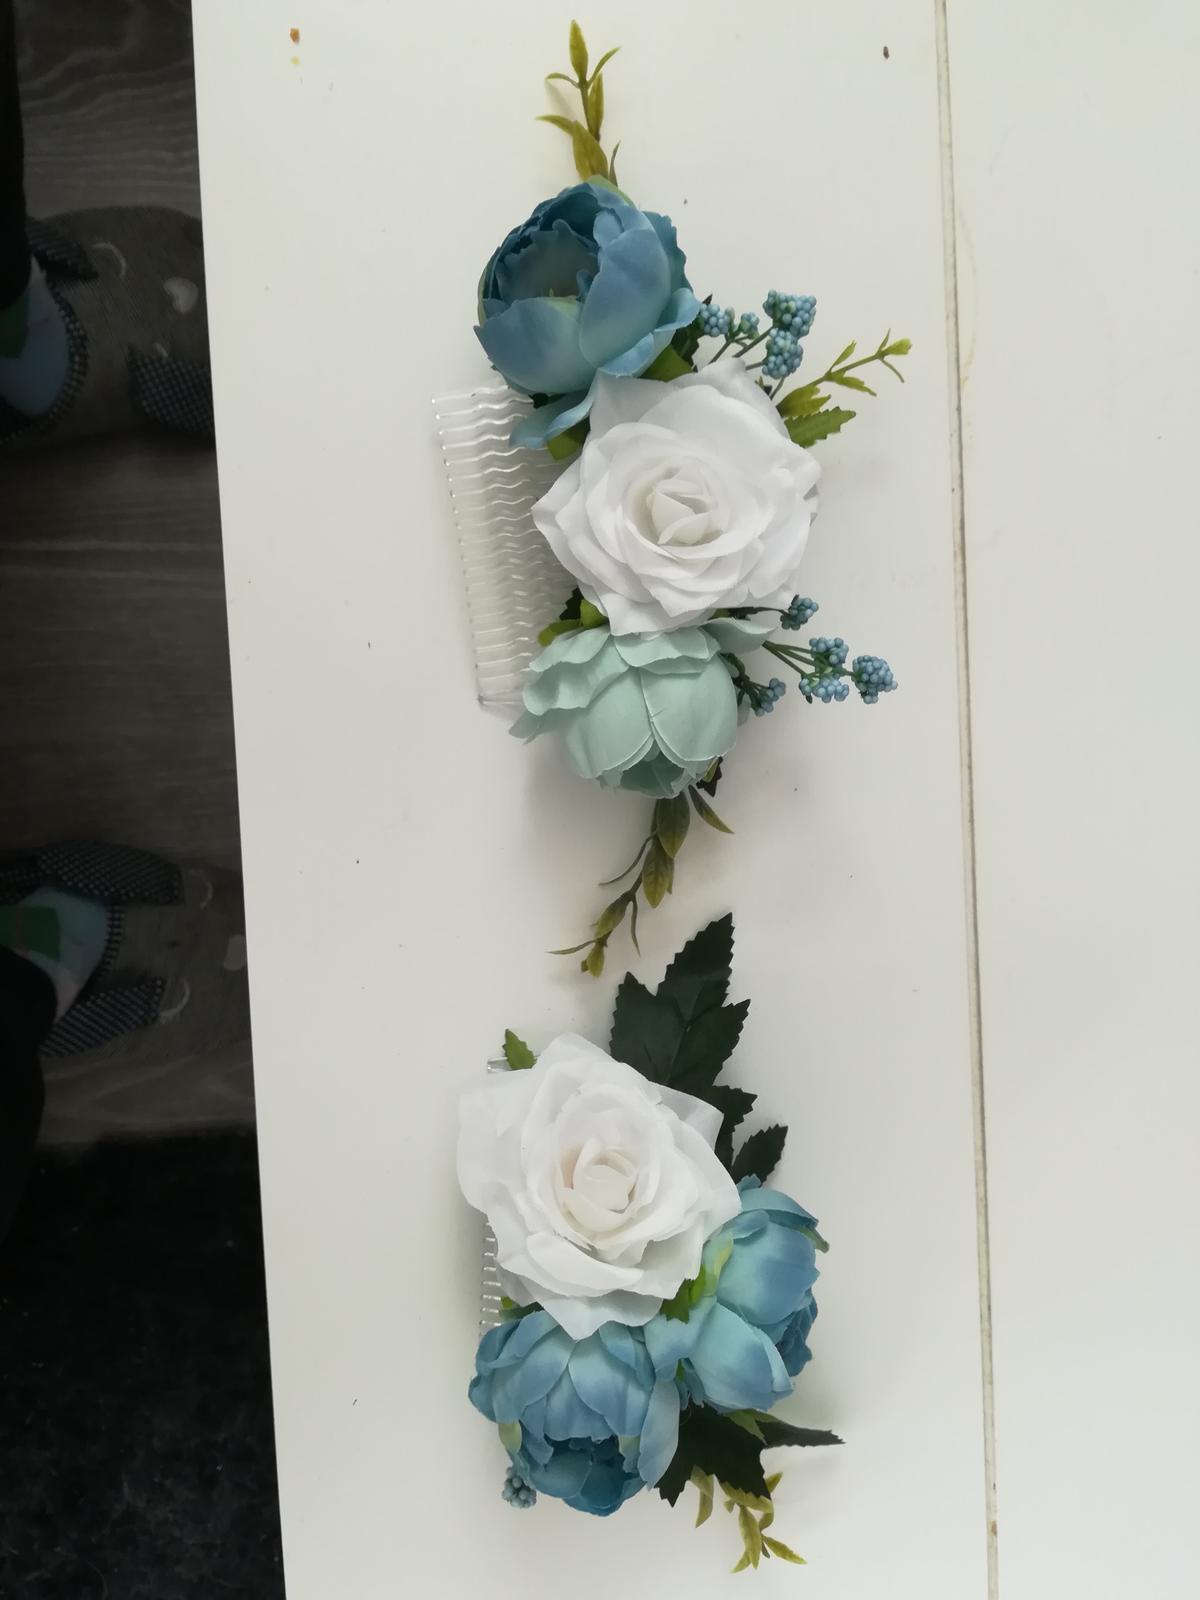 Moja handmade svadba - Obrázok č. 4